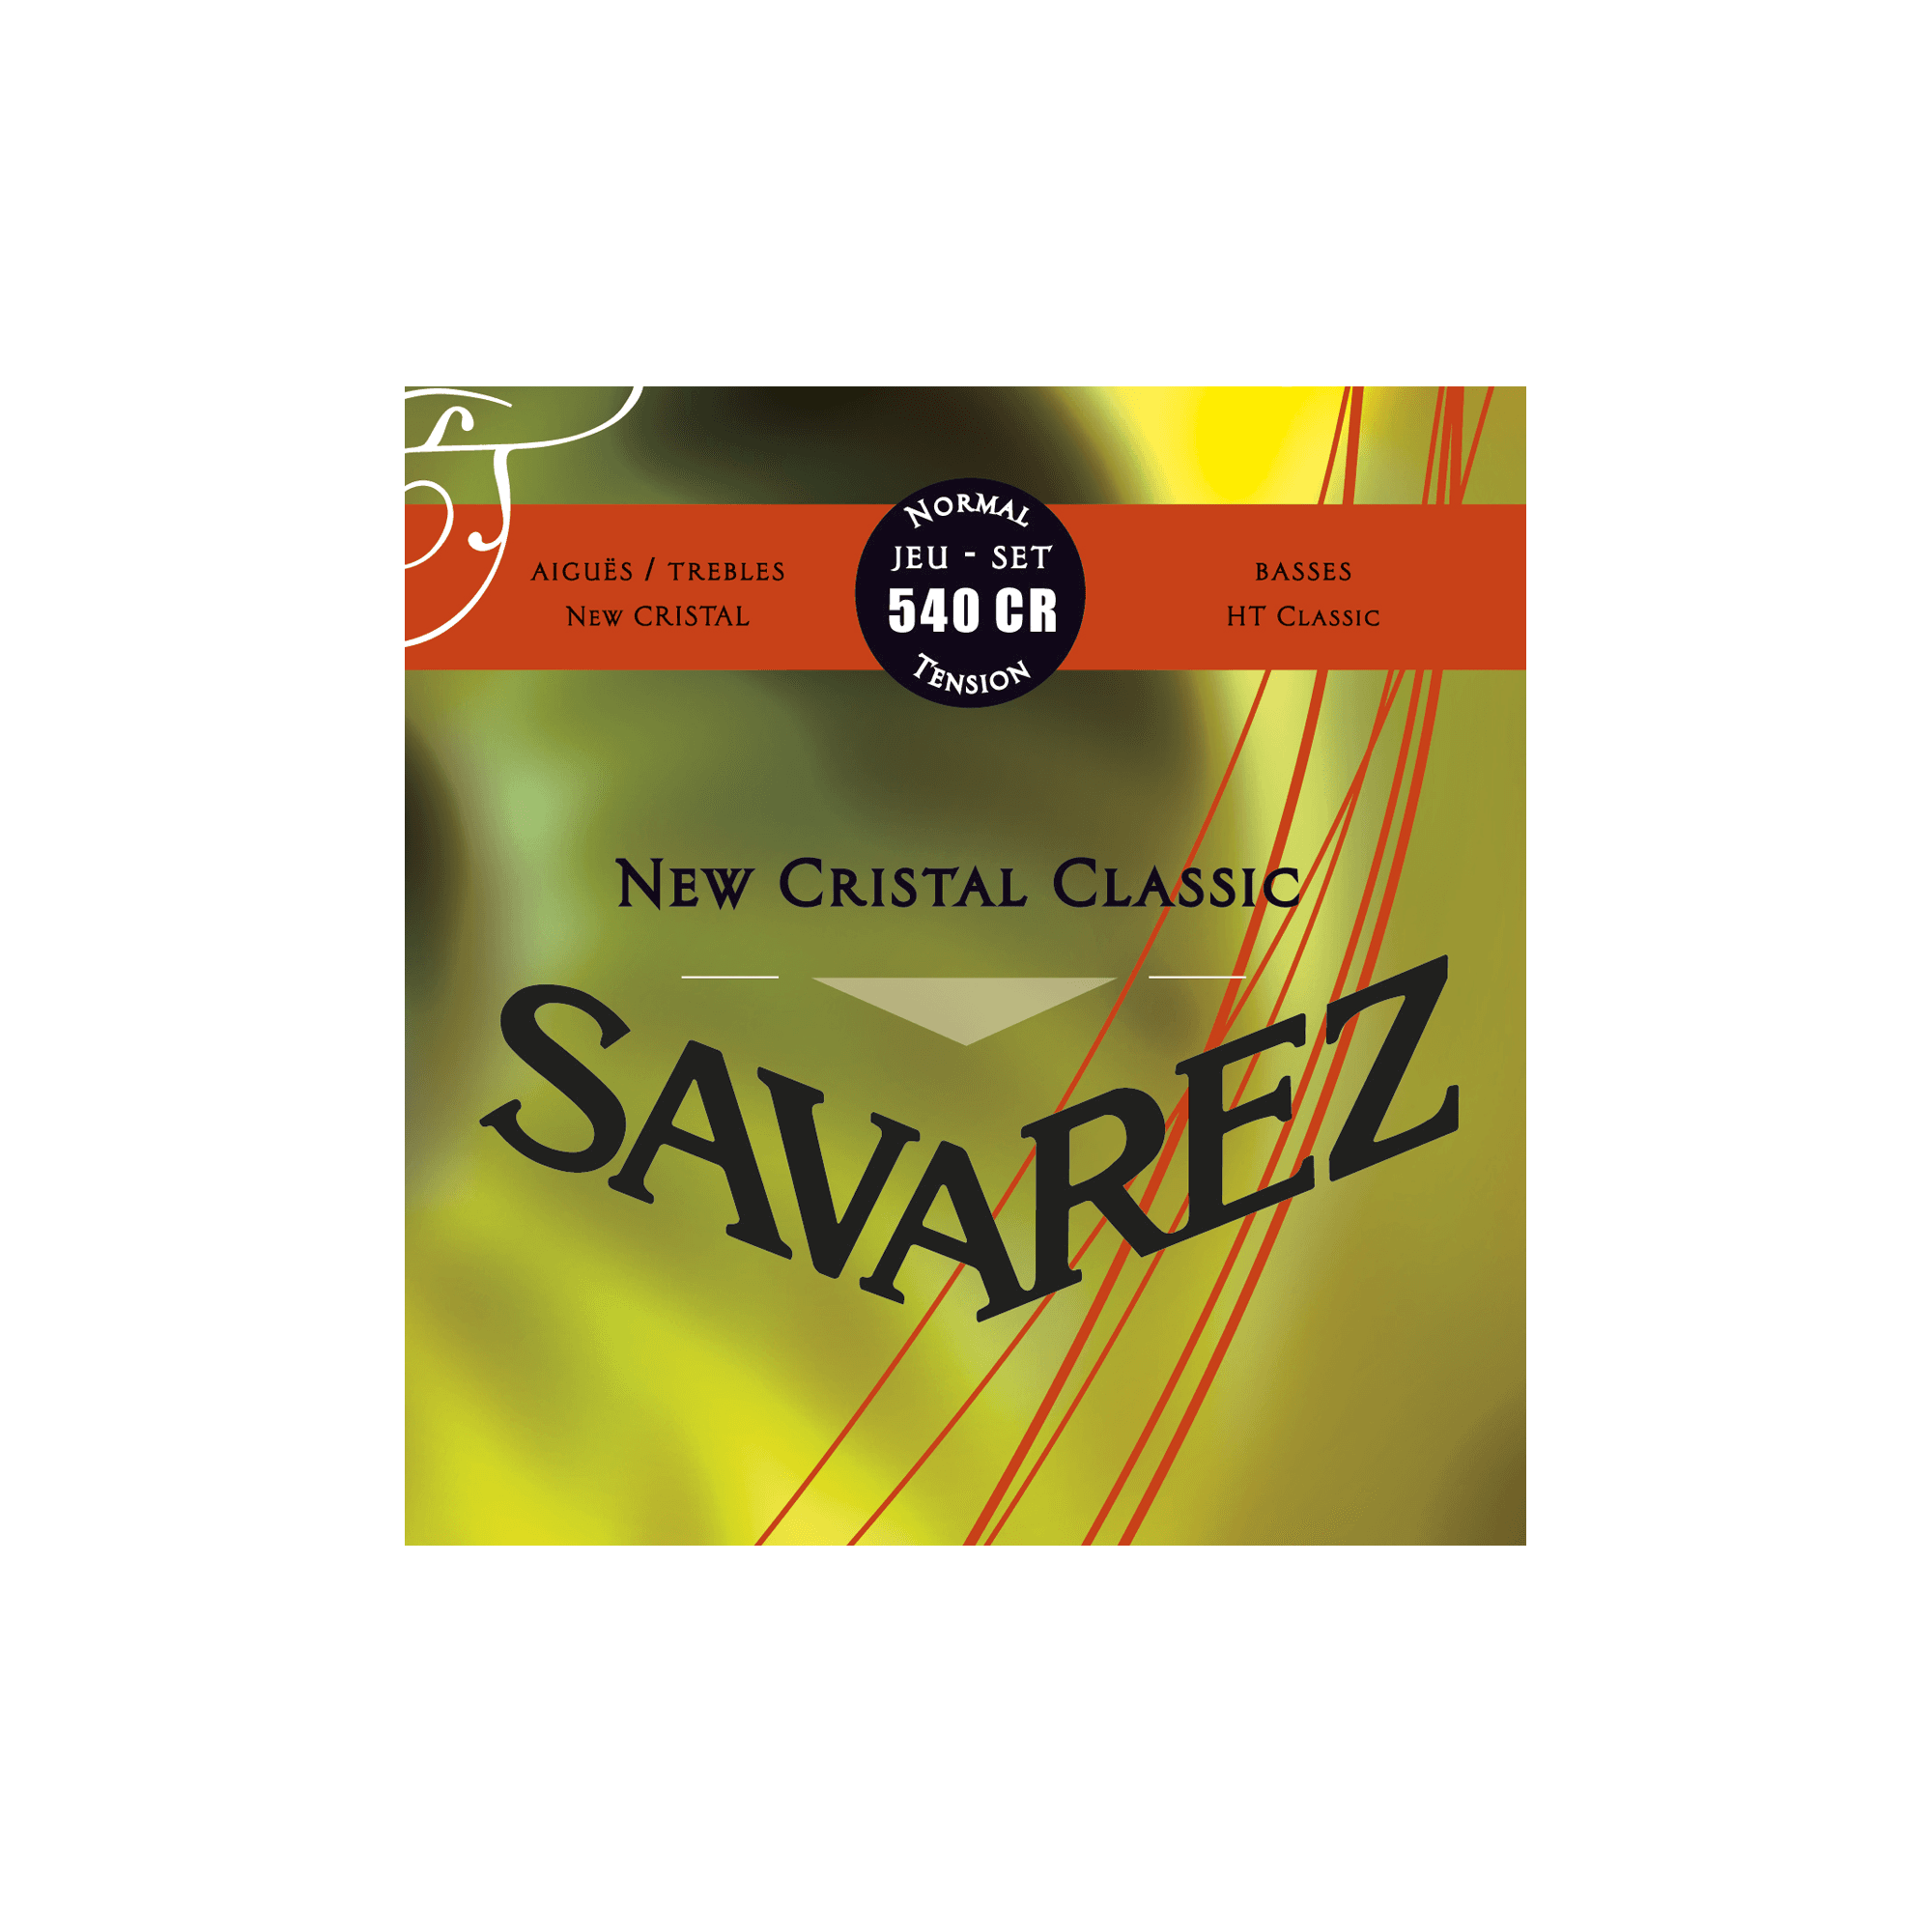 SAVAREZ 540 CR